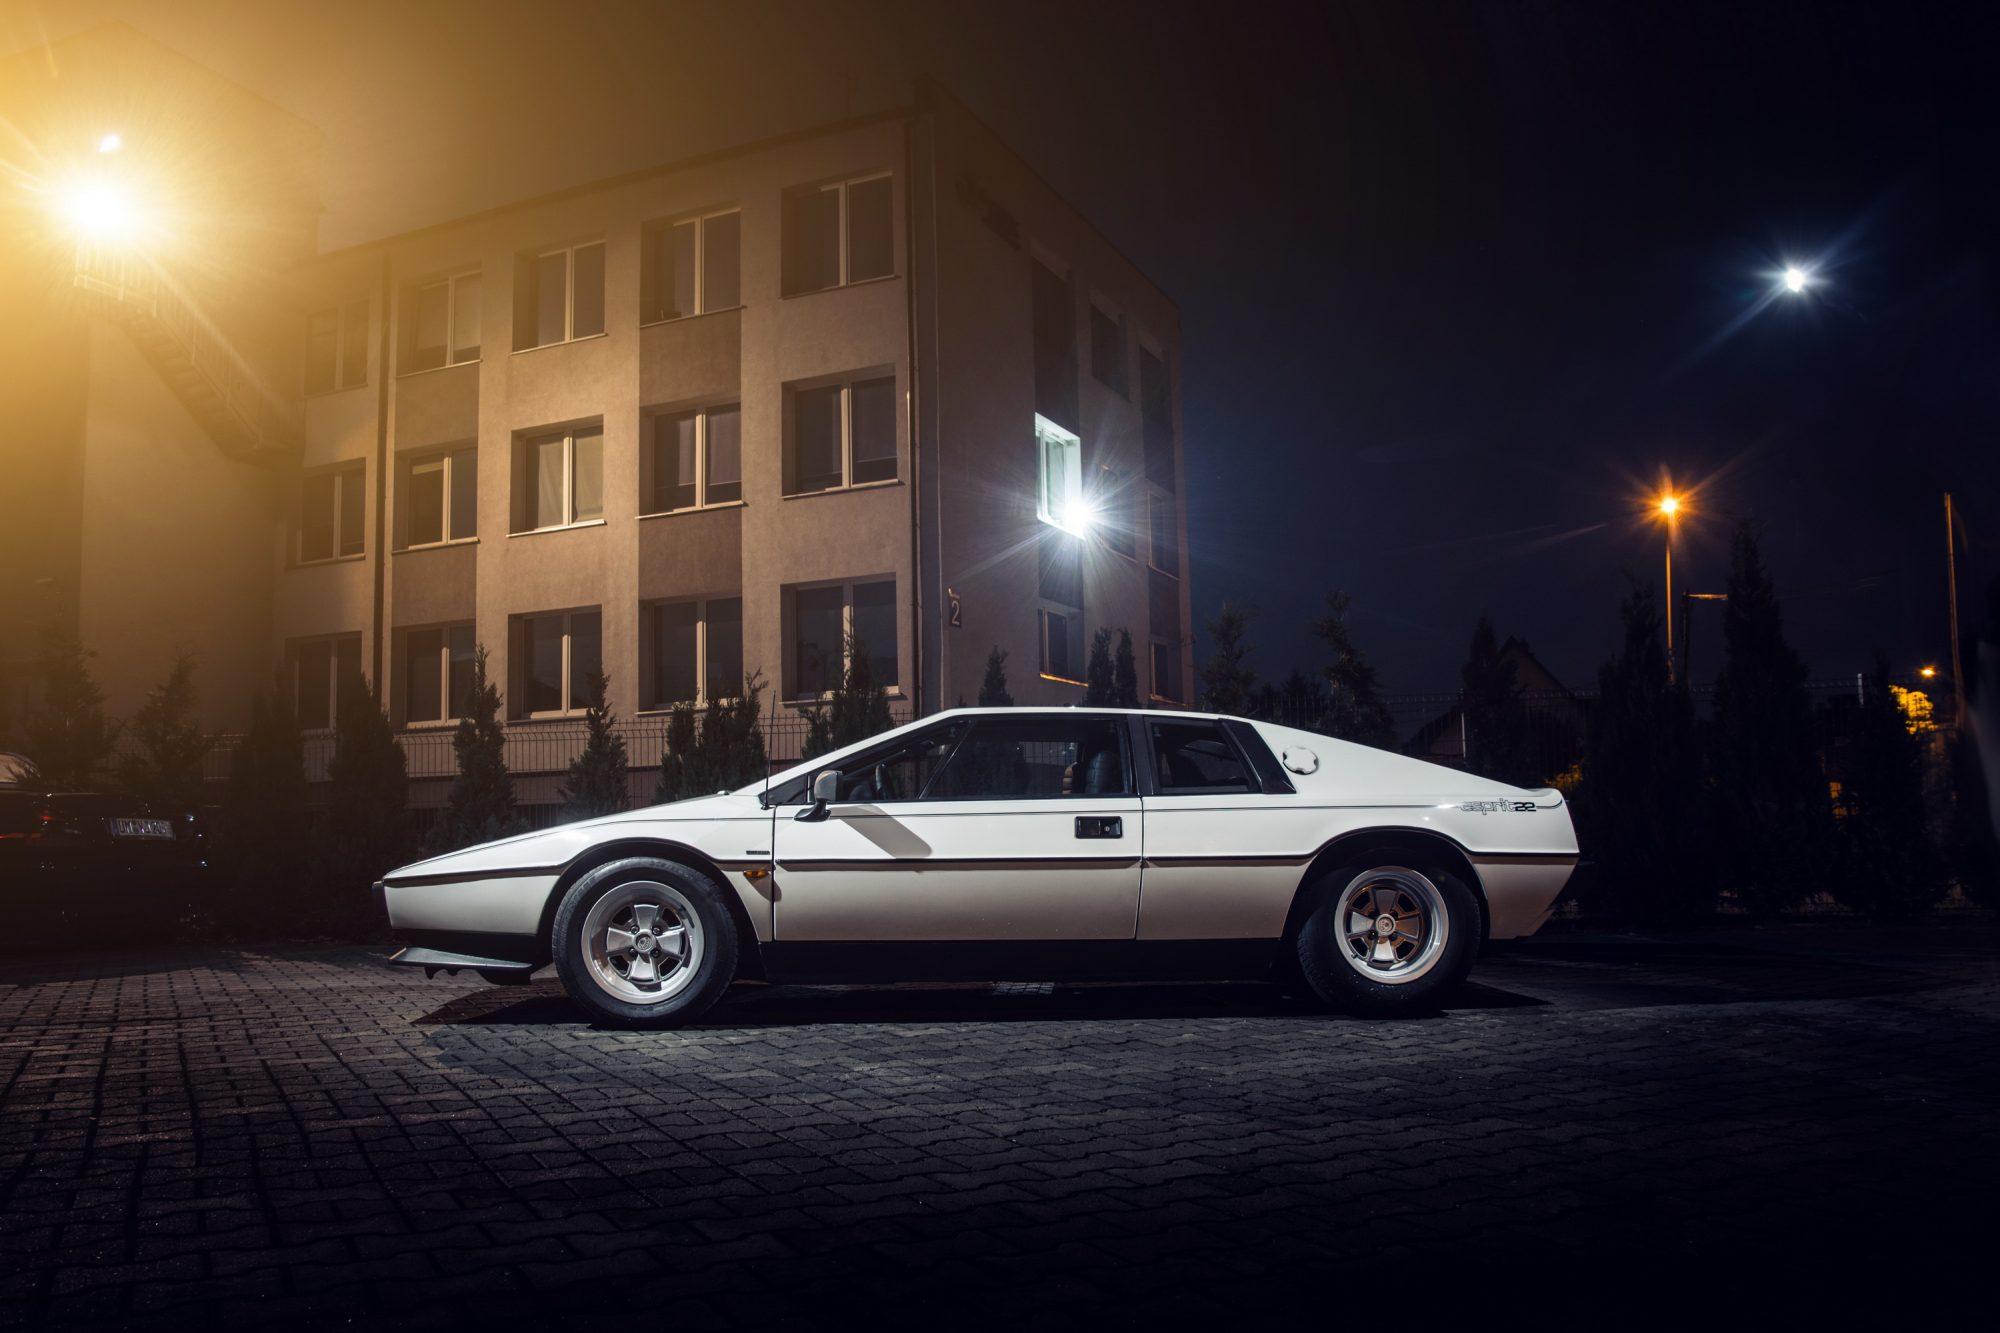 Lotus Esprit Car Upholstery Szczecin Olczak Com